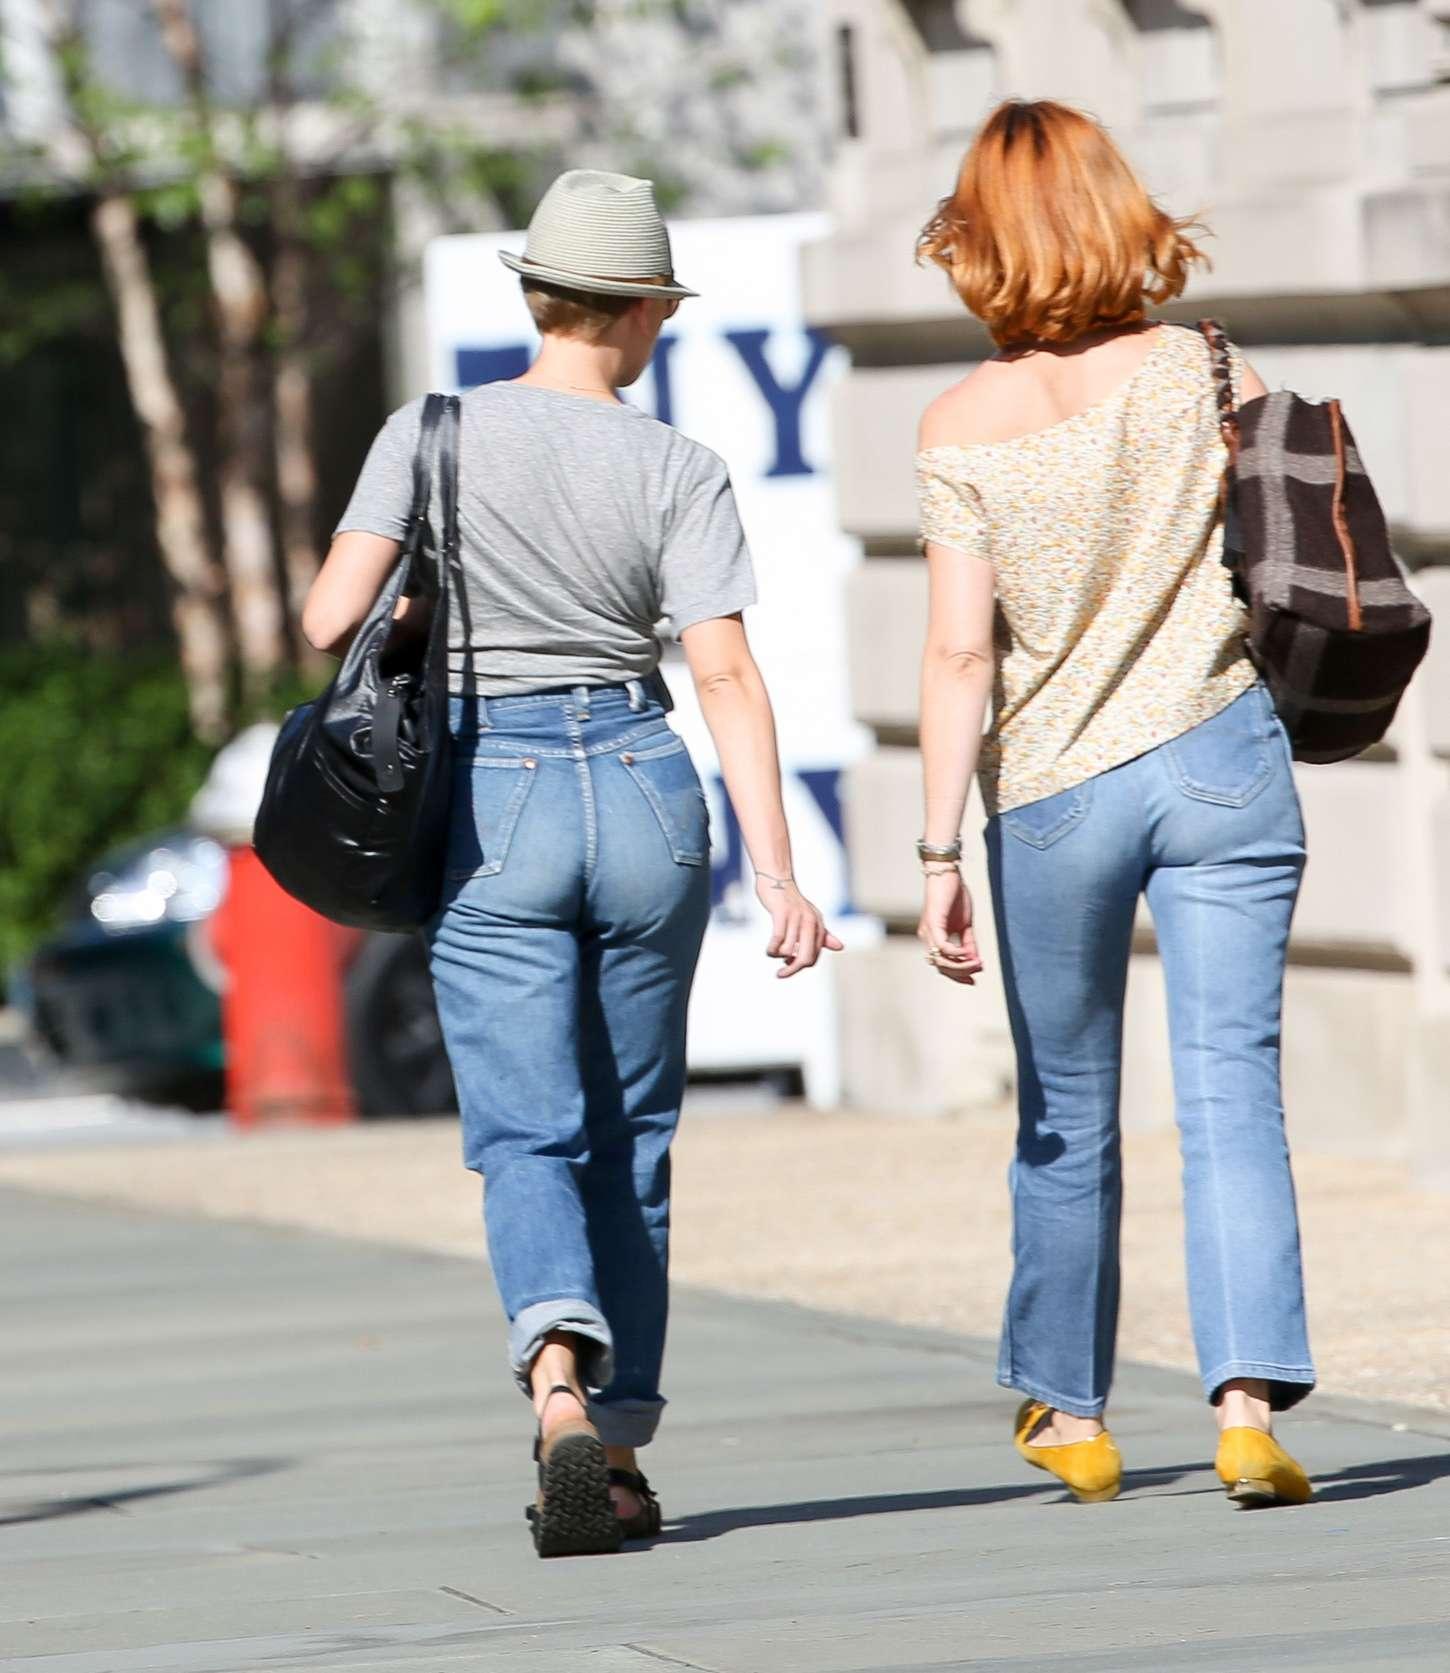 Scarlett Johansson 2015 : Scarlett Johansson in Jeans -05